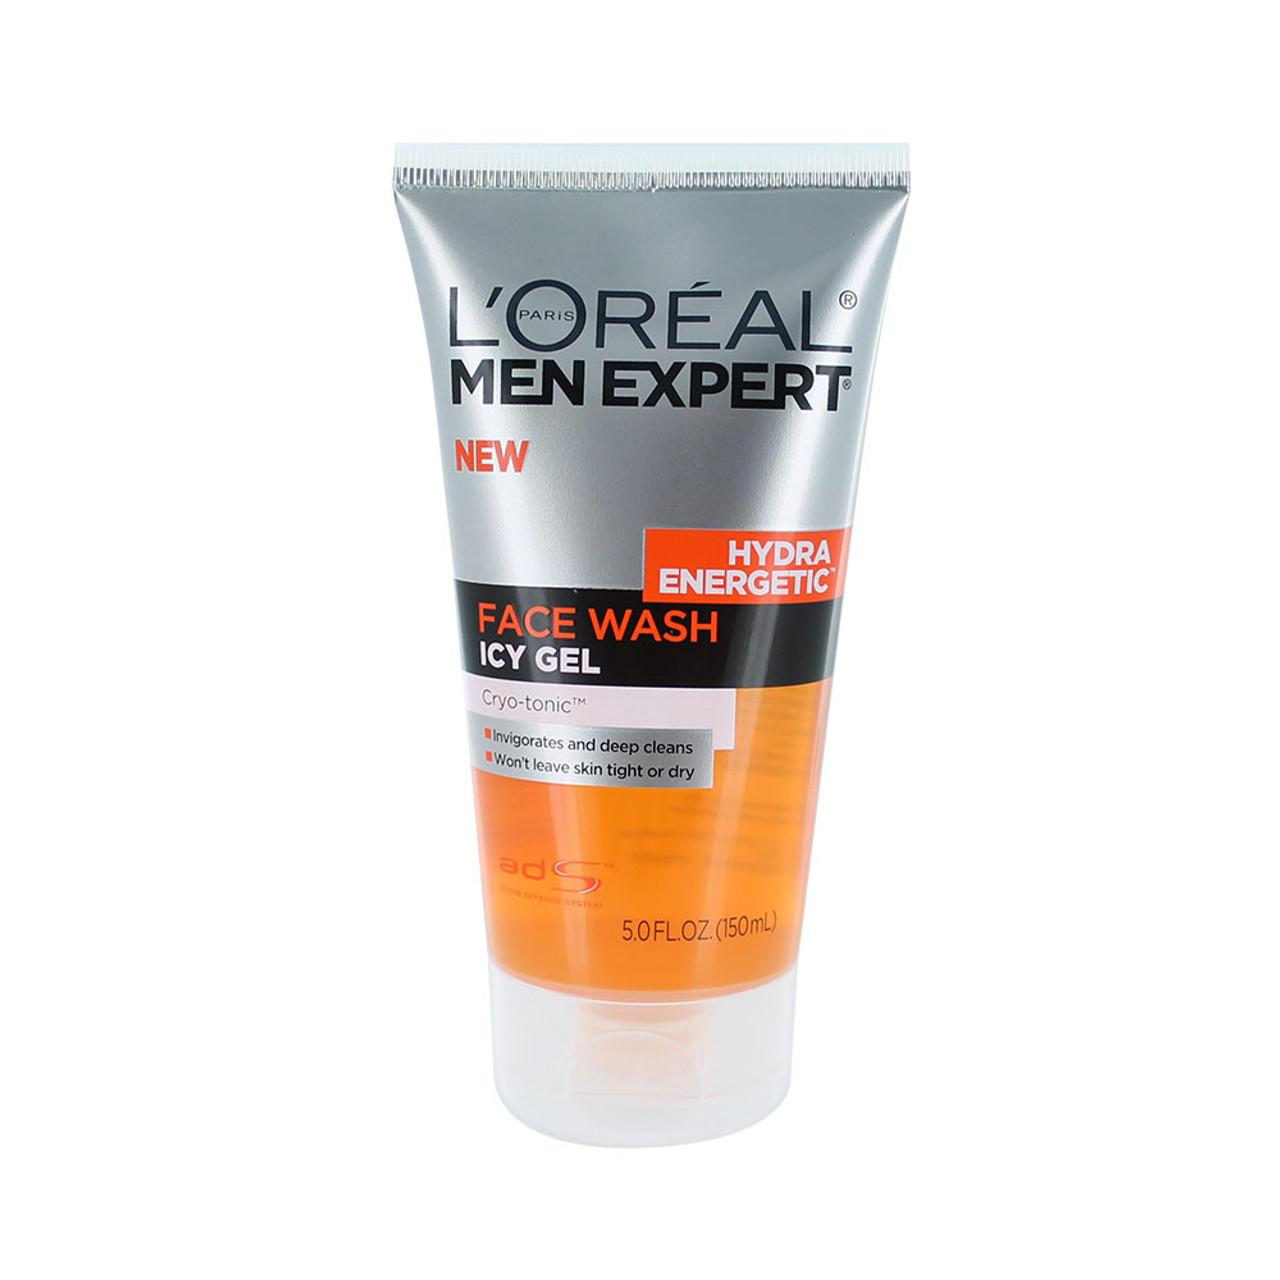 Loreal Mens Expert Hydra Energetic Icy Gel Face Wash